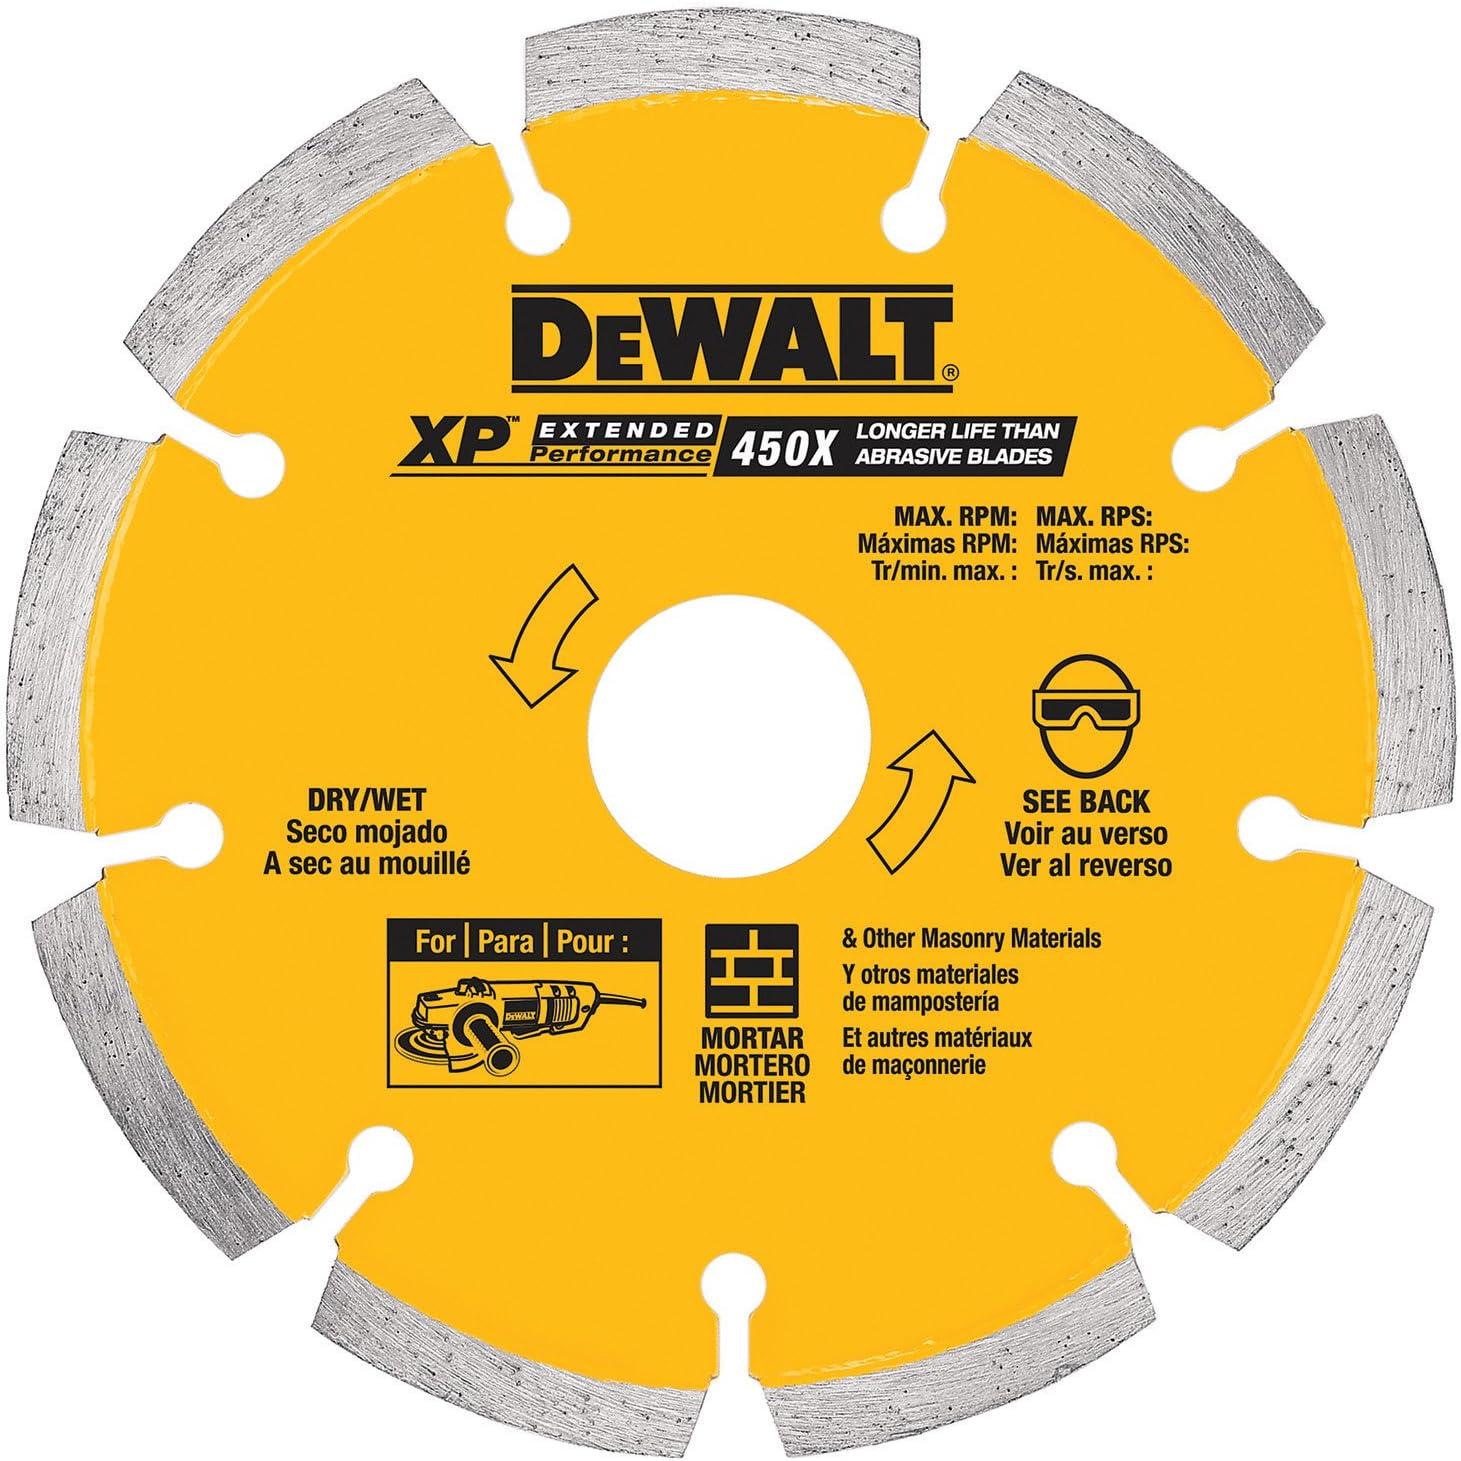 DEWALT DW4710 4-Inch Tuck Point Diamond Saw with Blade 5 8-Inch New Max 85% OFF Free Shipping